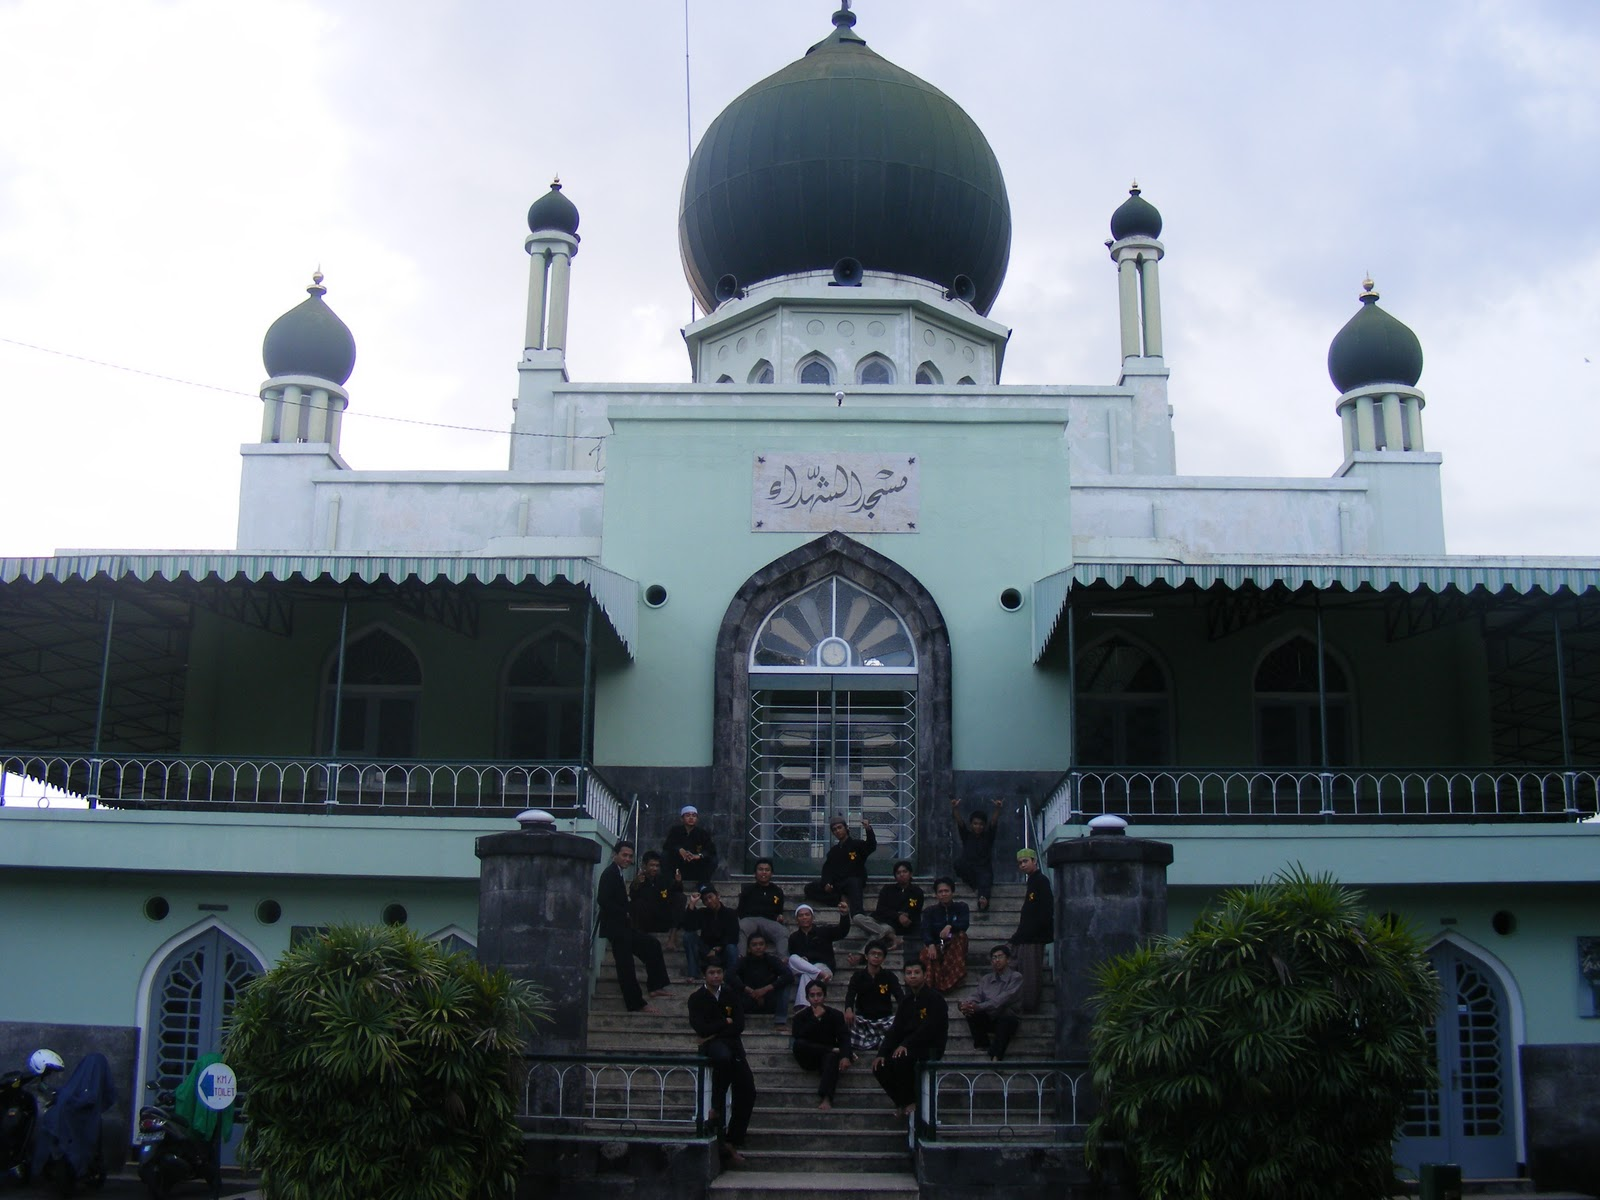 Profile Masjid Syuhada Yogyakarta Bulletin Kota